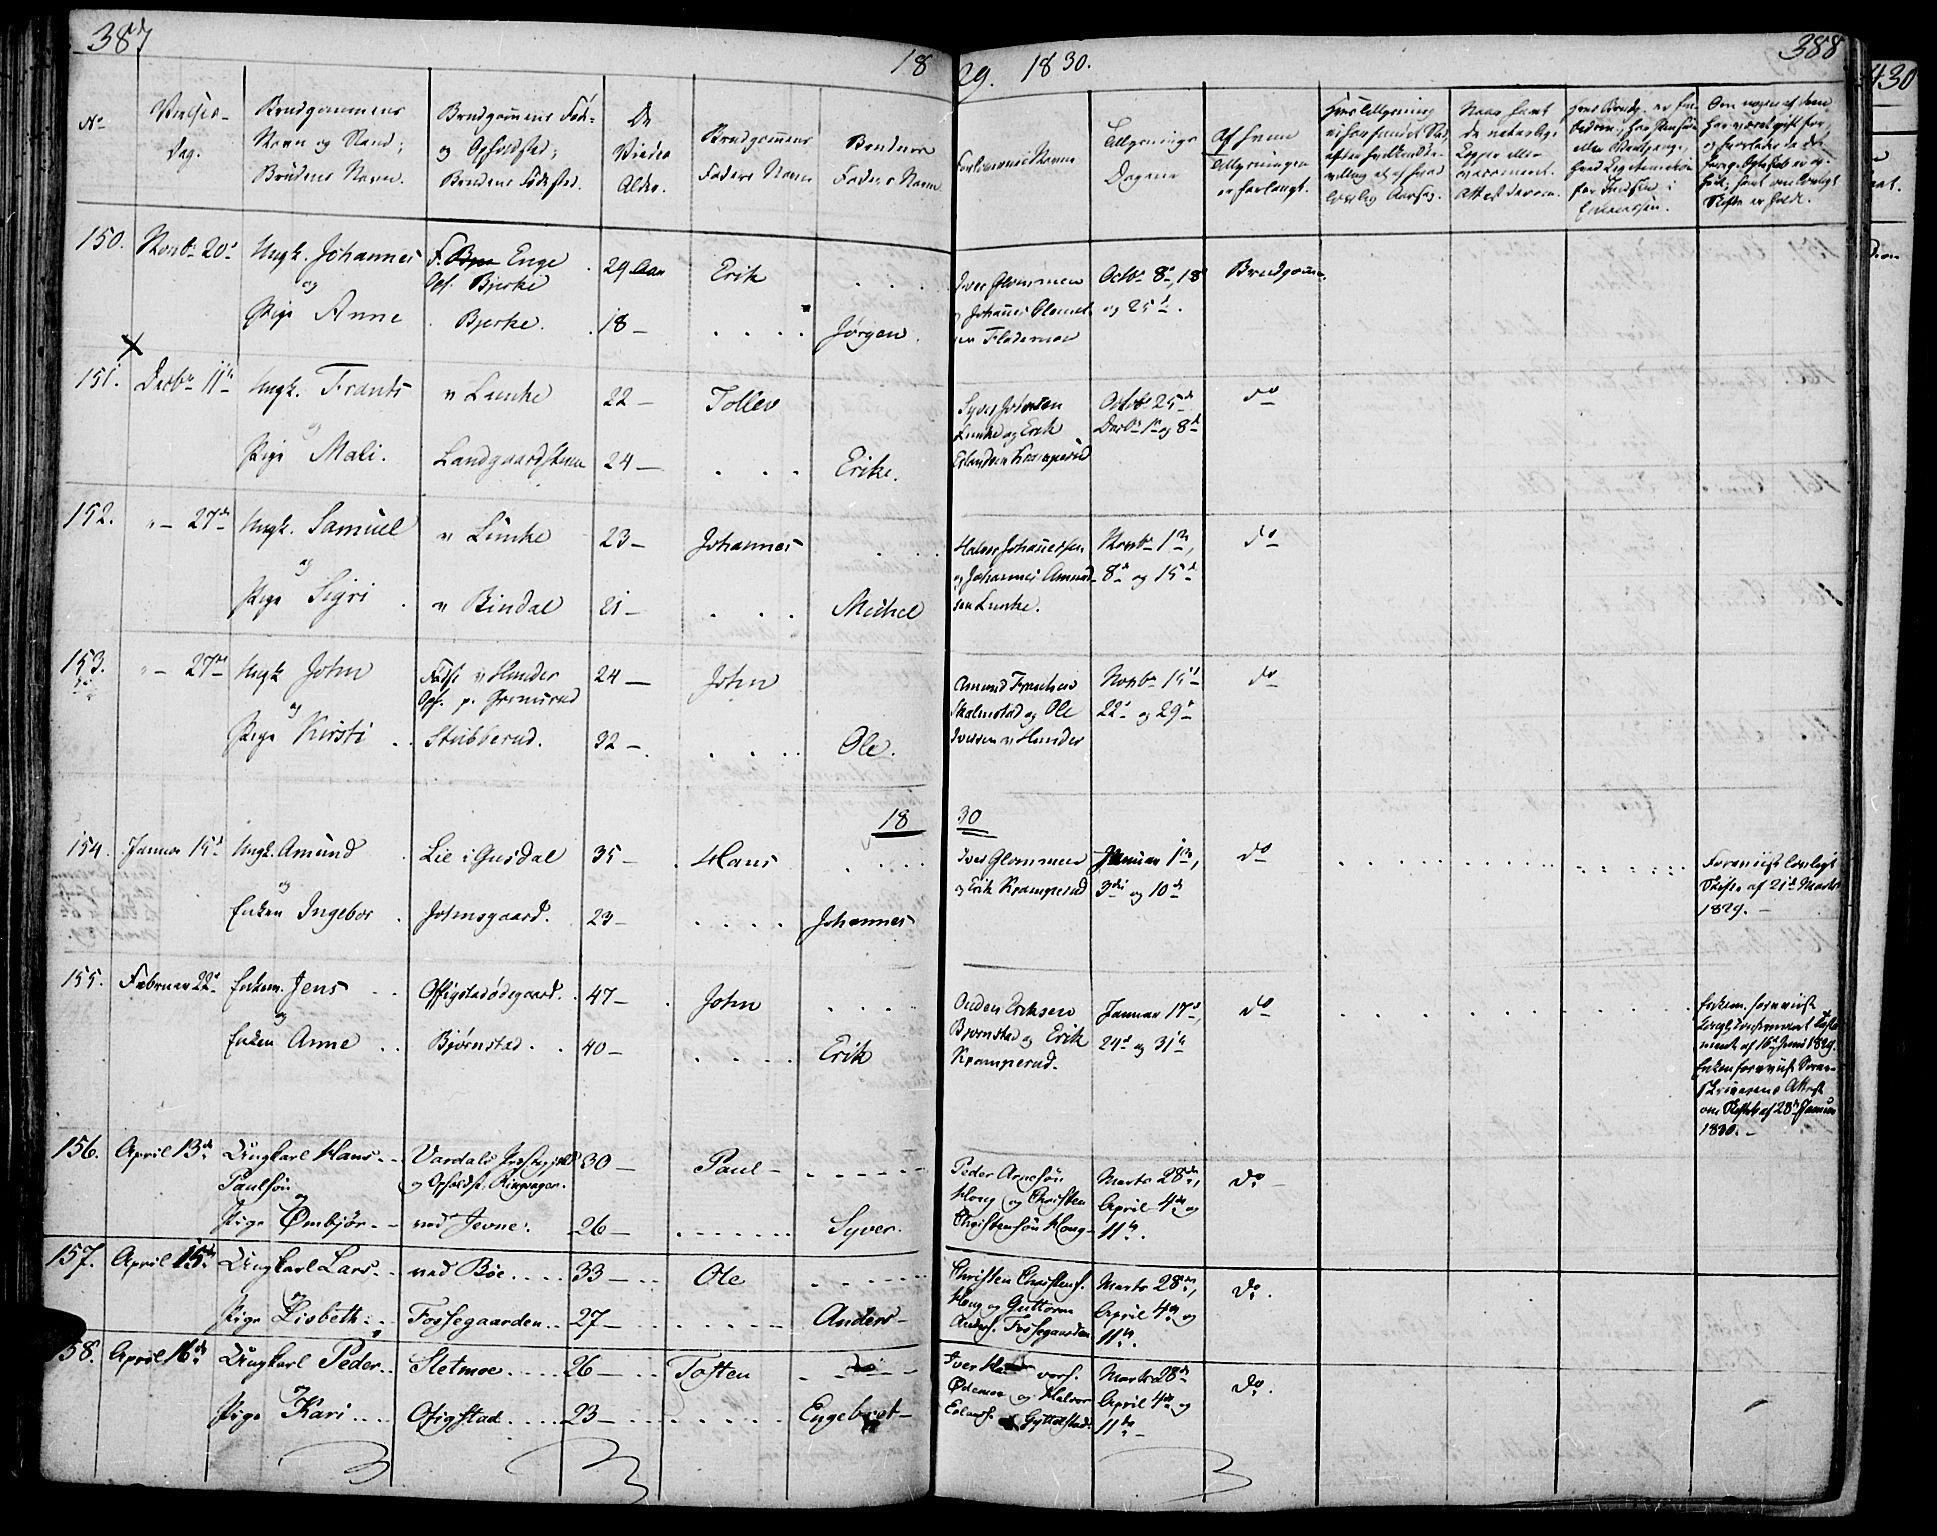 SAH, Øyer prestekontor, Ministerialbok nr. 4, 1824-1841, s. 387-388